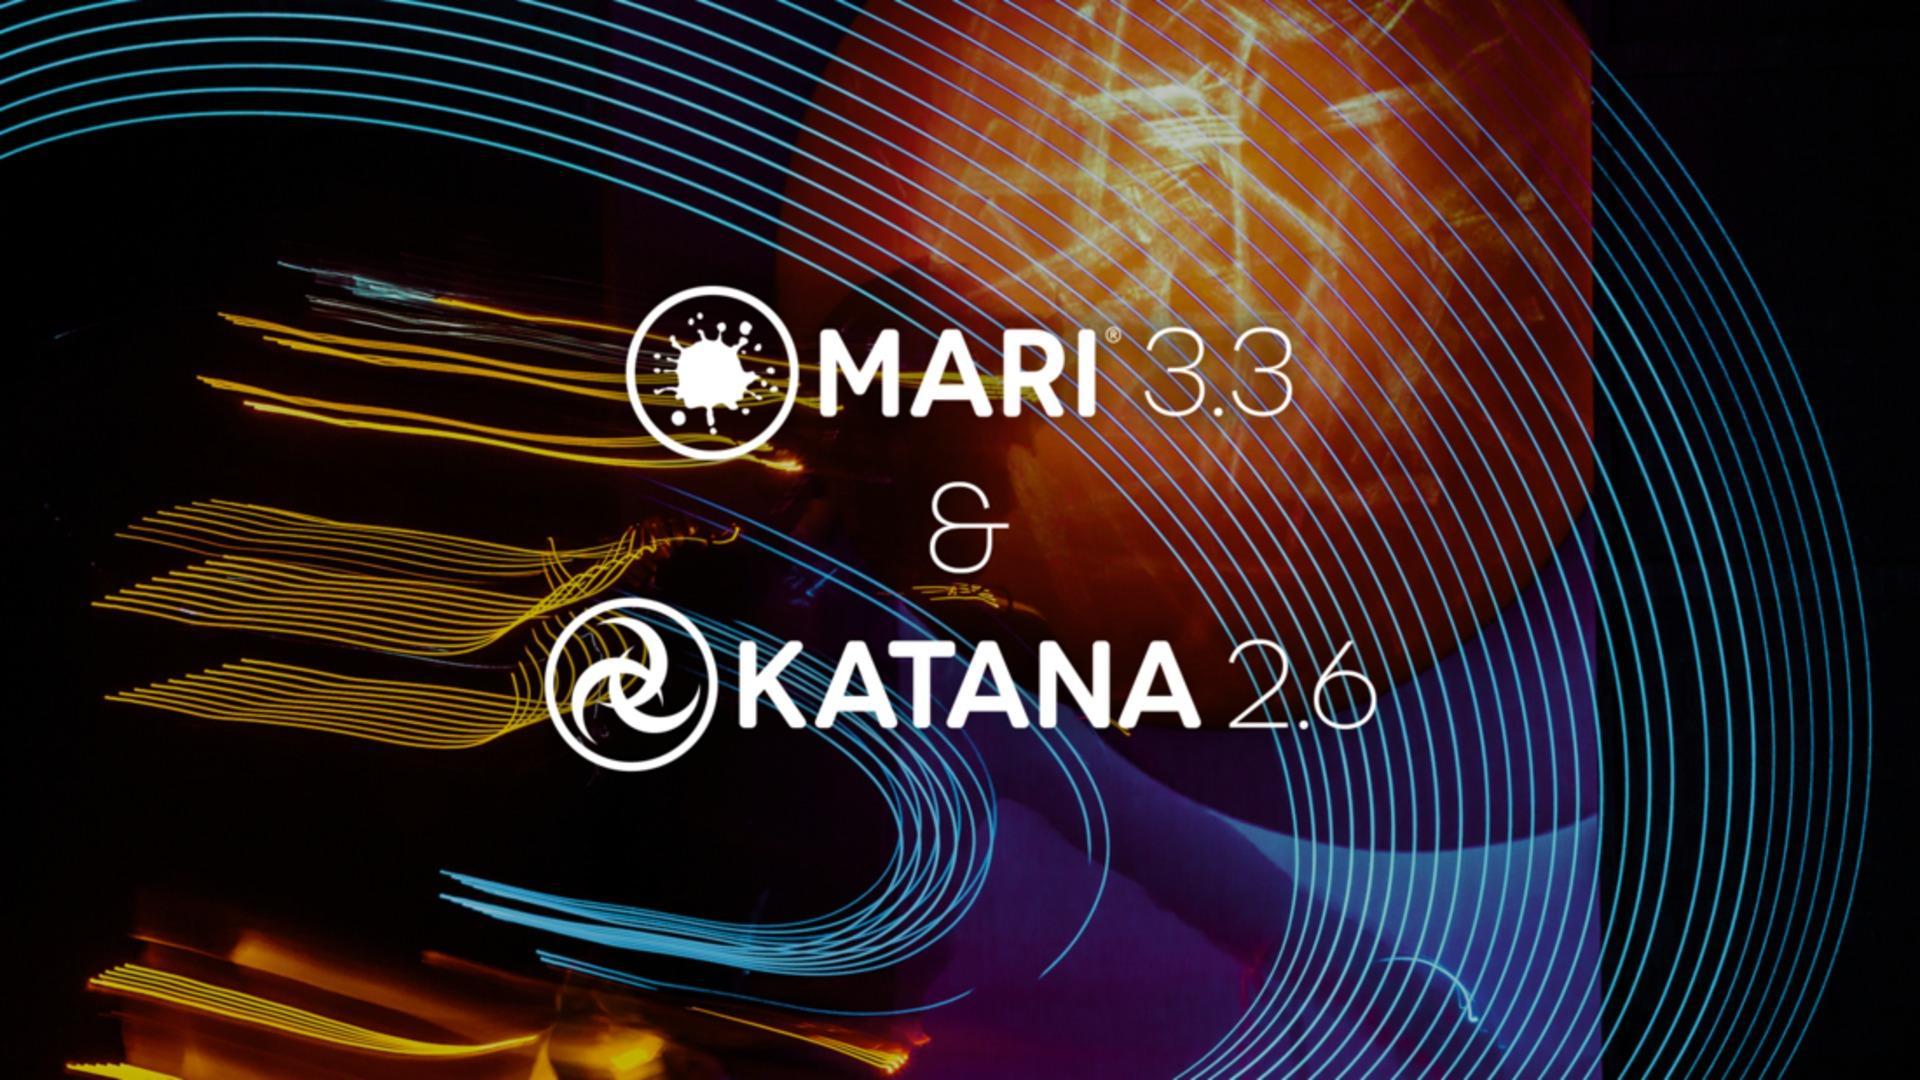 Mari 3.3 and Katana 2.6